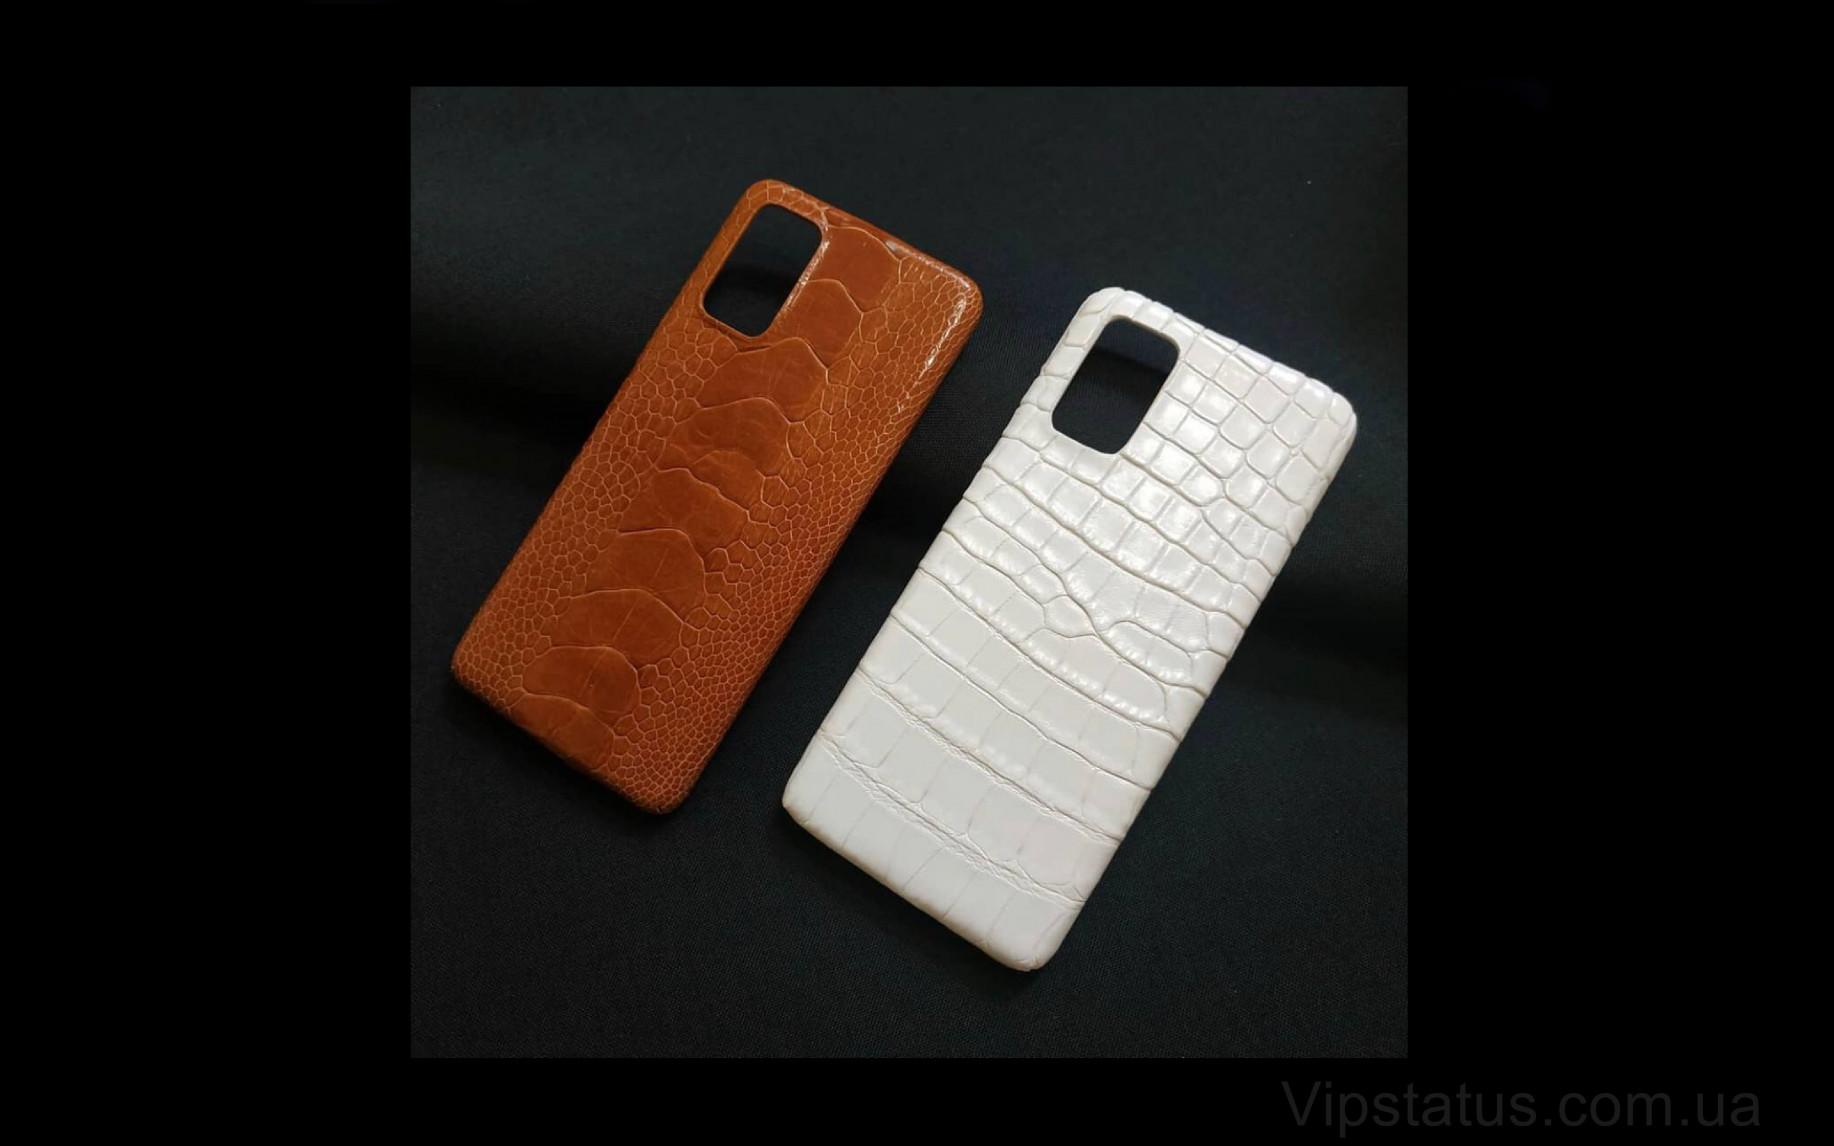 Elite White Style Вип чехол Samsung S20 S21 Plus кожа крокодила White Style Vip case Samsung S20 S21 Plus Crocodile leather image 2